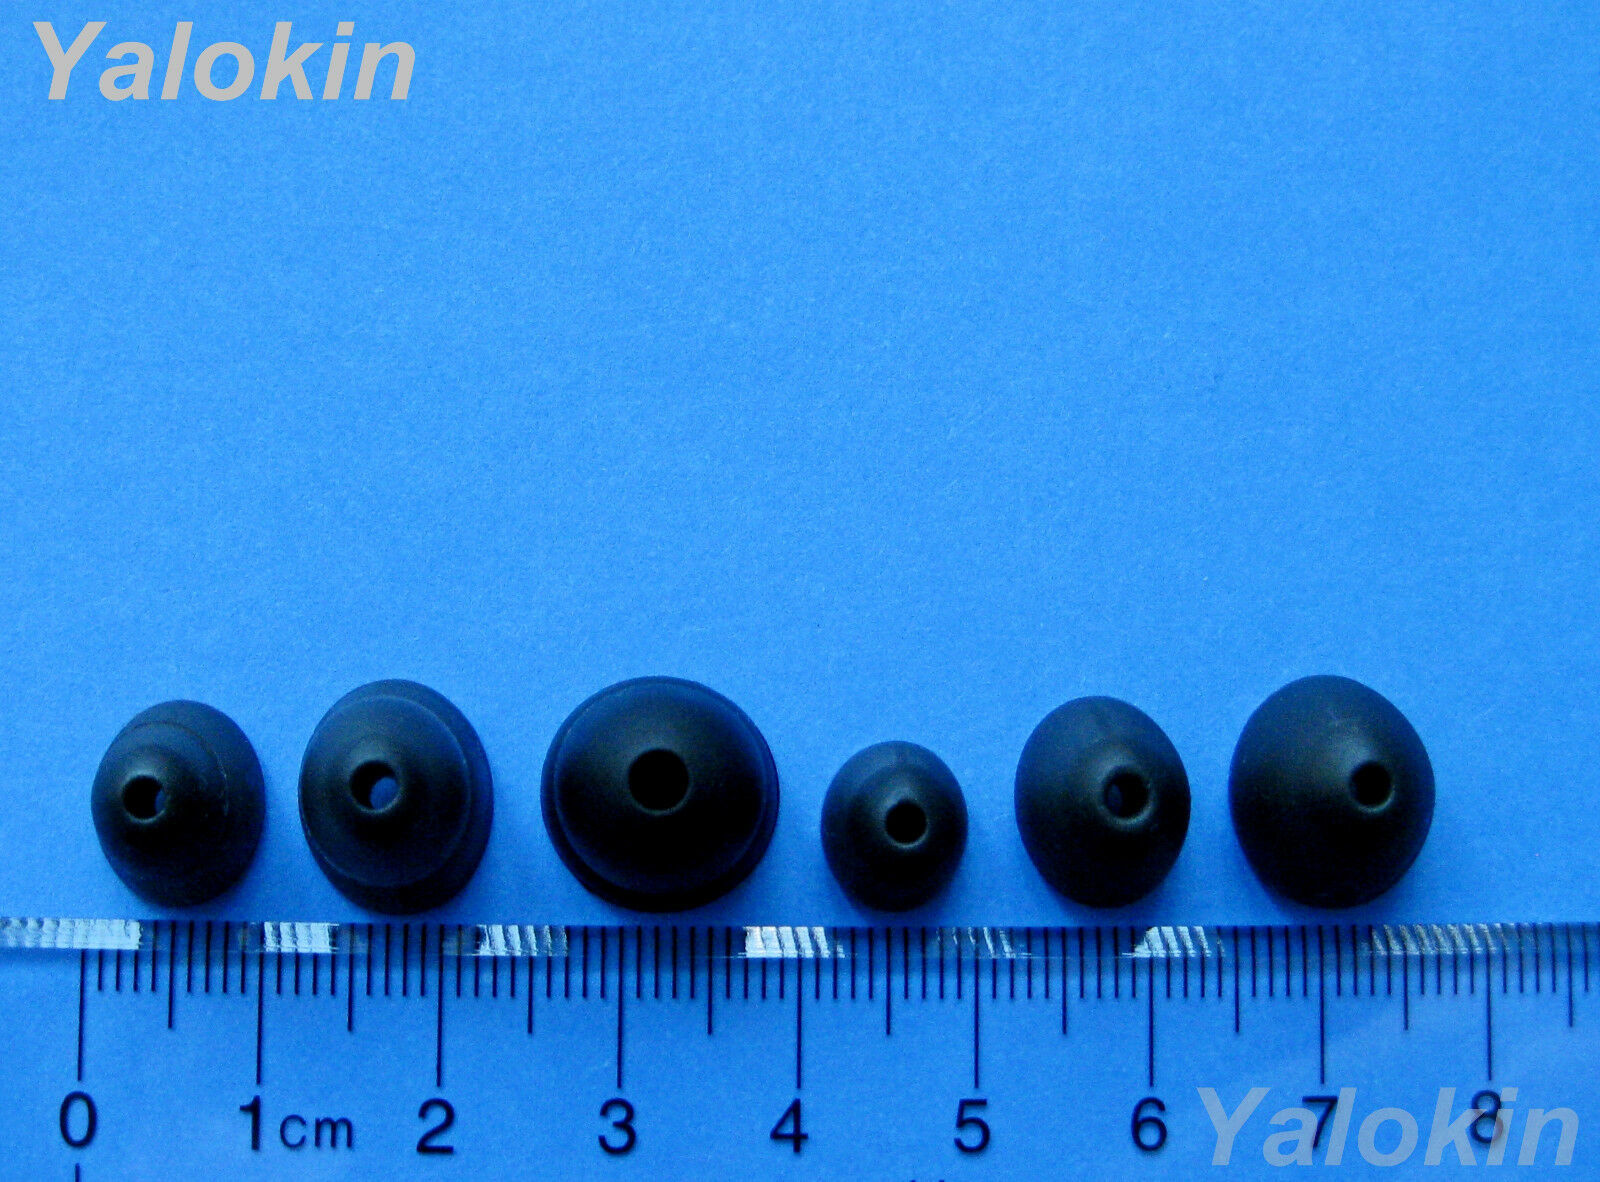 M-SLB 8pcs CX 5.00 Triple Flange Replacement Eartips for Sennheiser CX 3.00